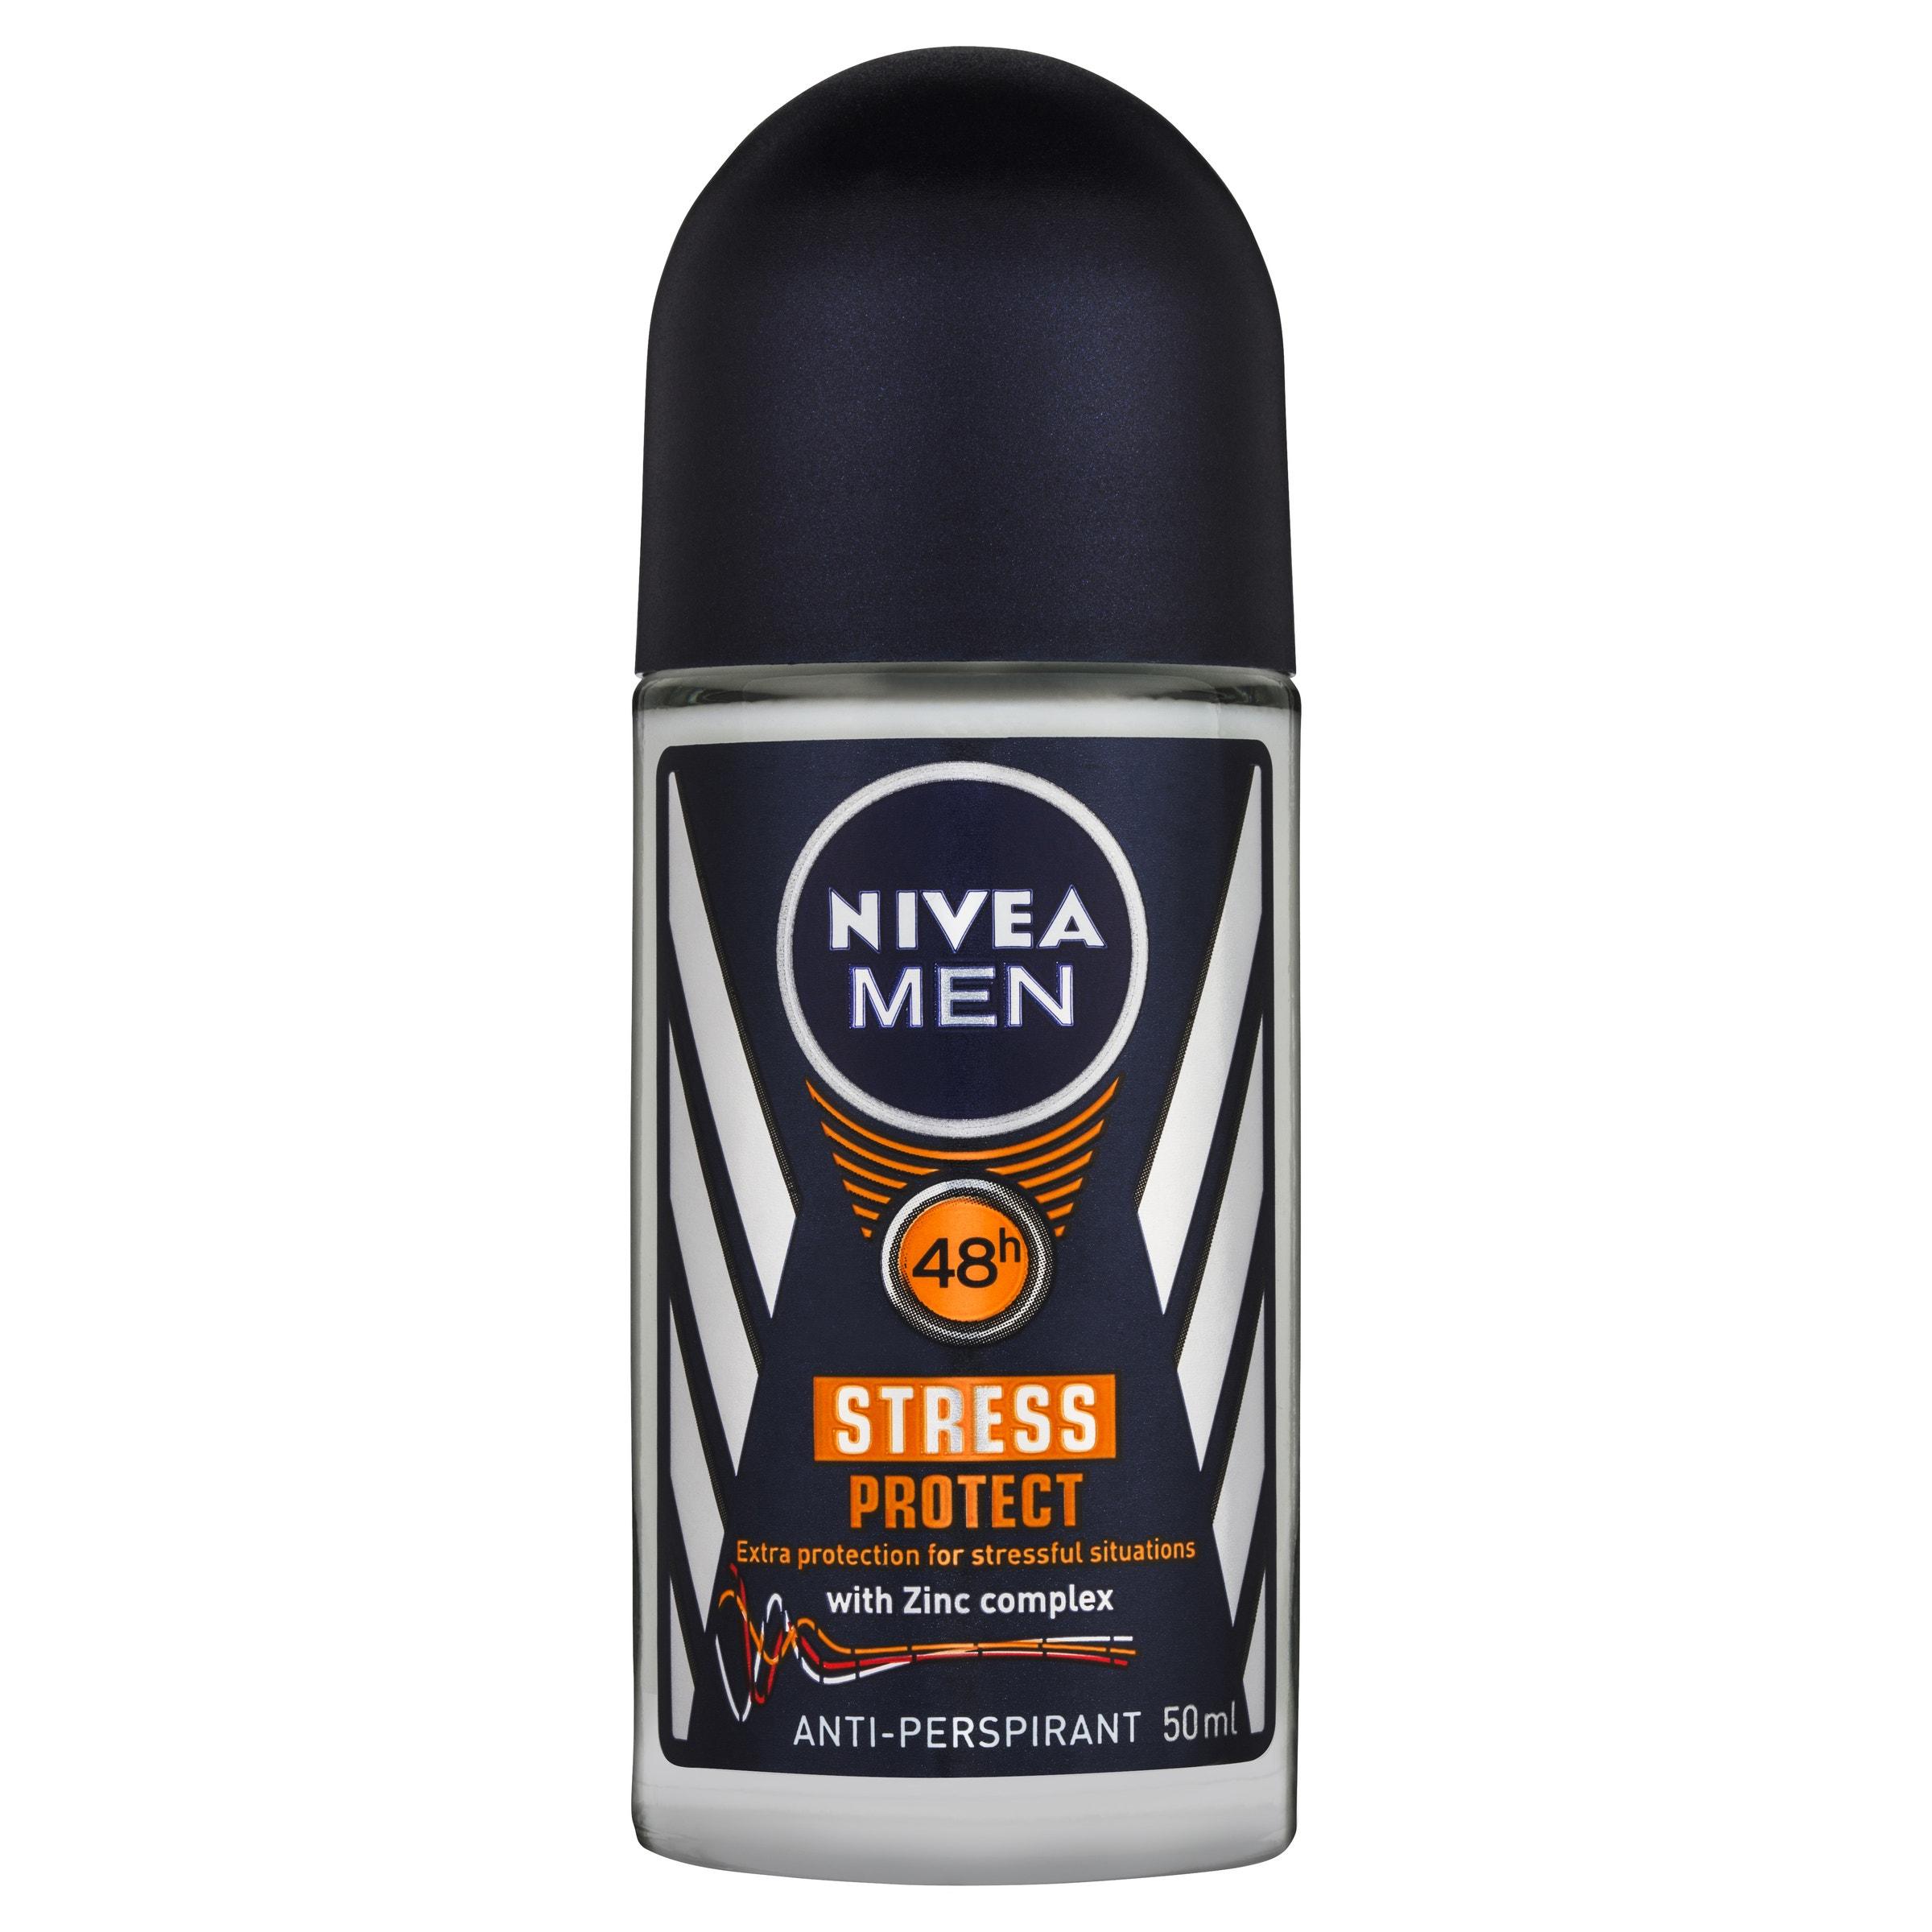 Roll On Deodorant Chemist Direct Rexona Natural Fresh 50ml